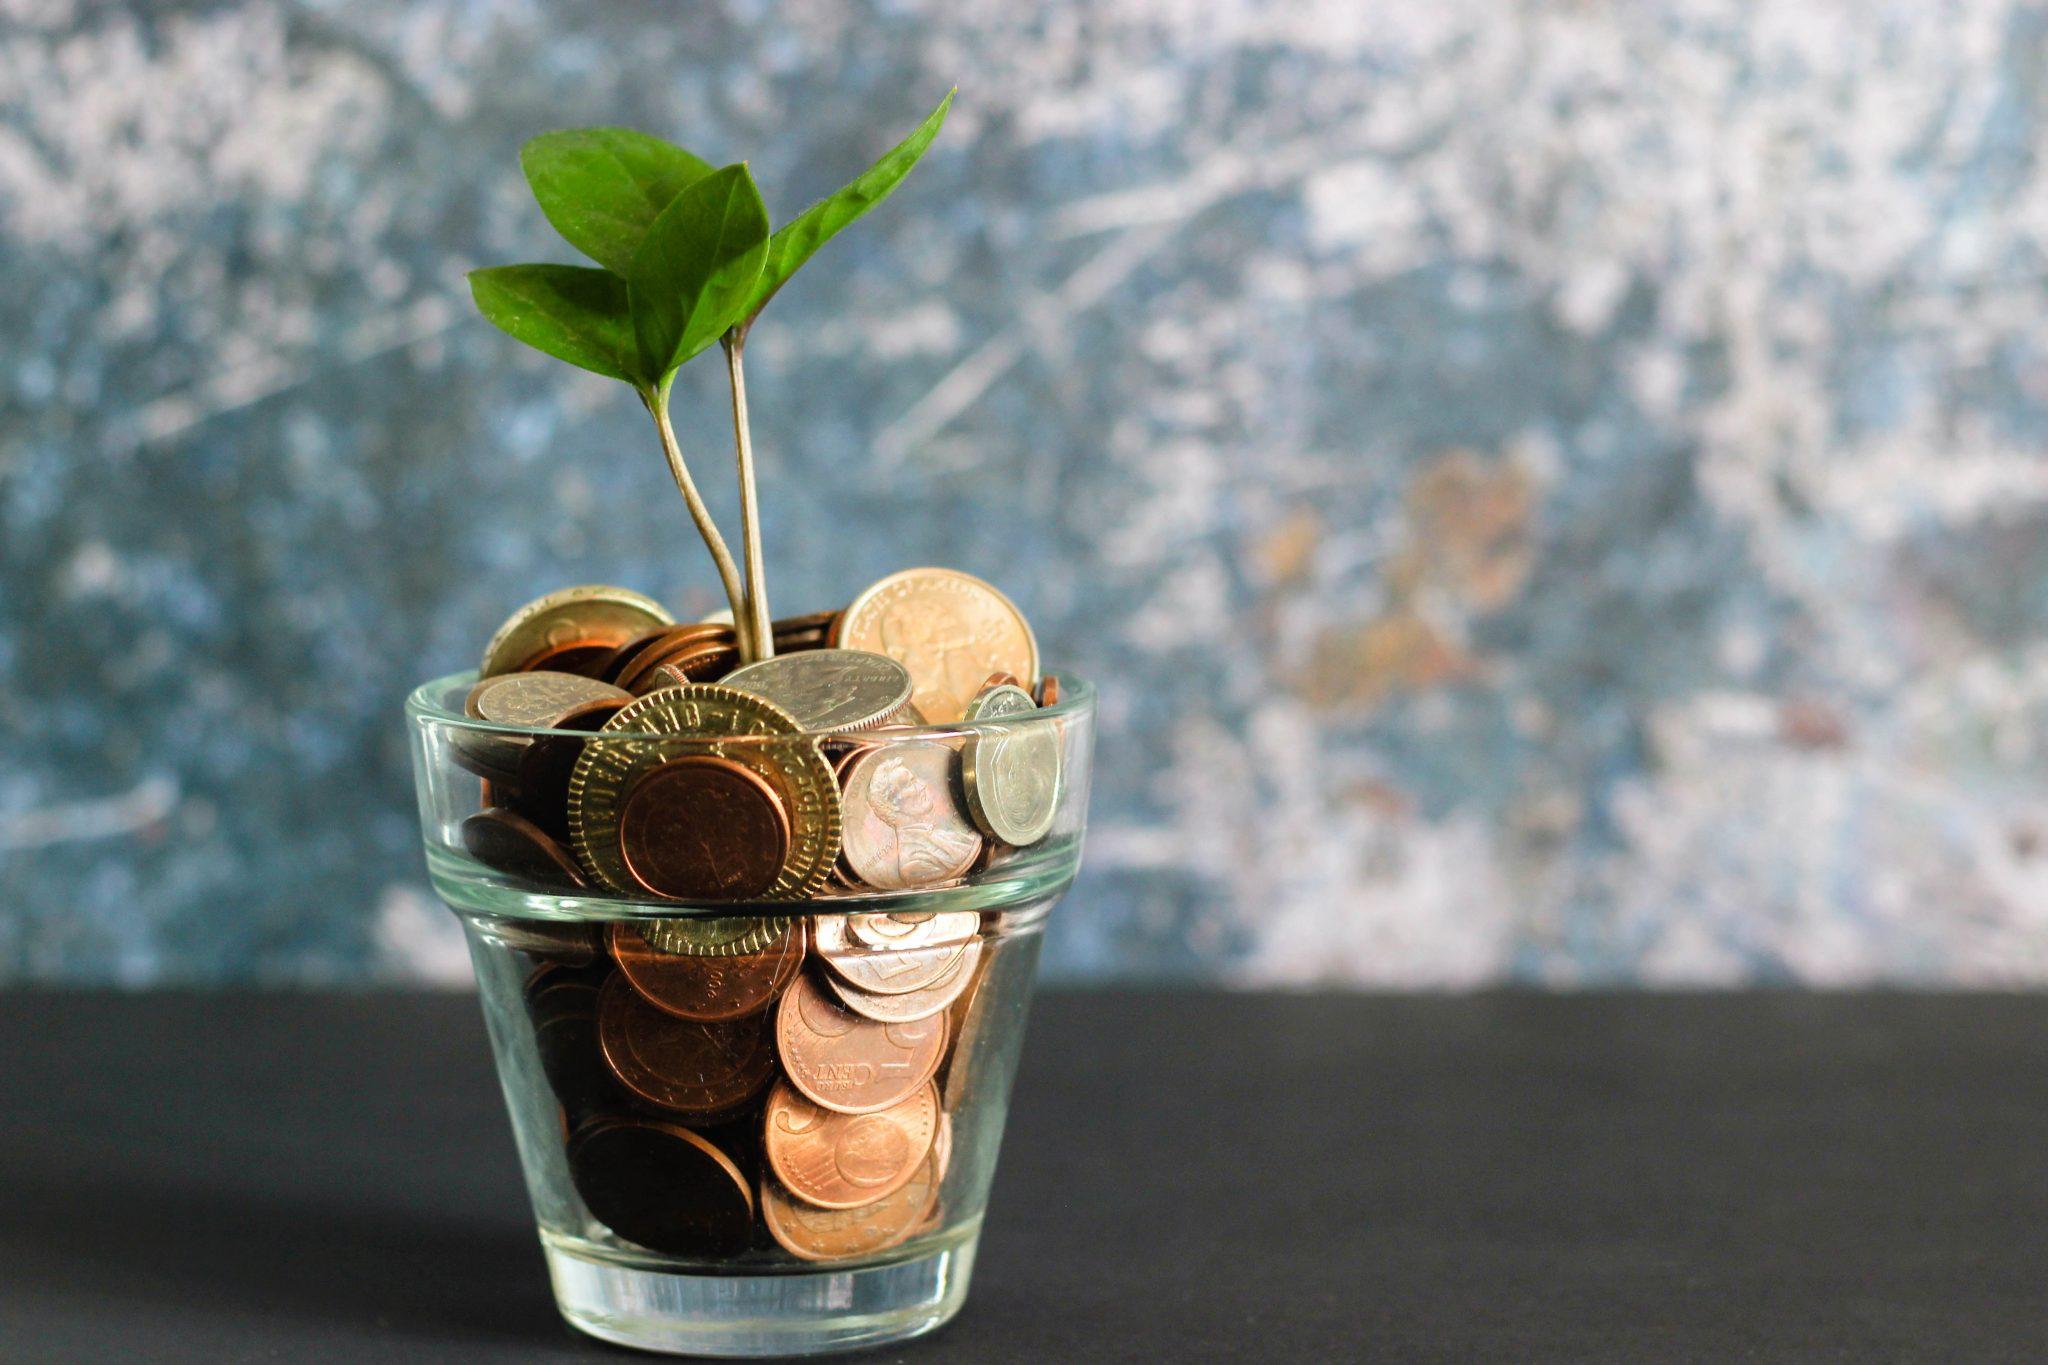 A Modern Business Taxation Framework That Works For A European Circular Economy